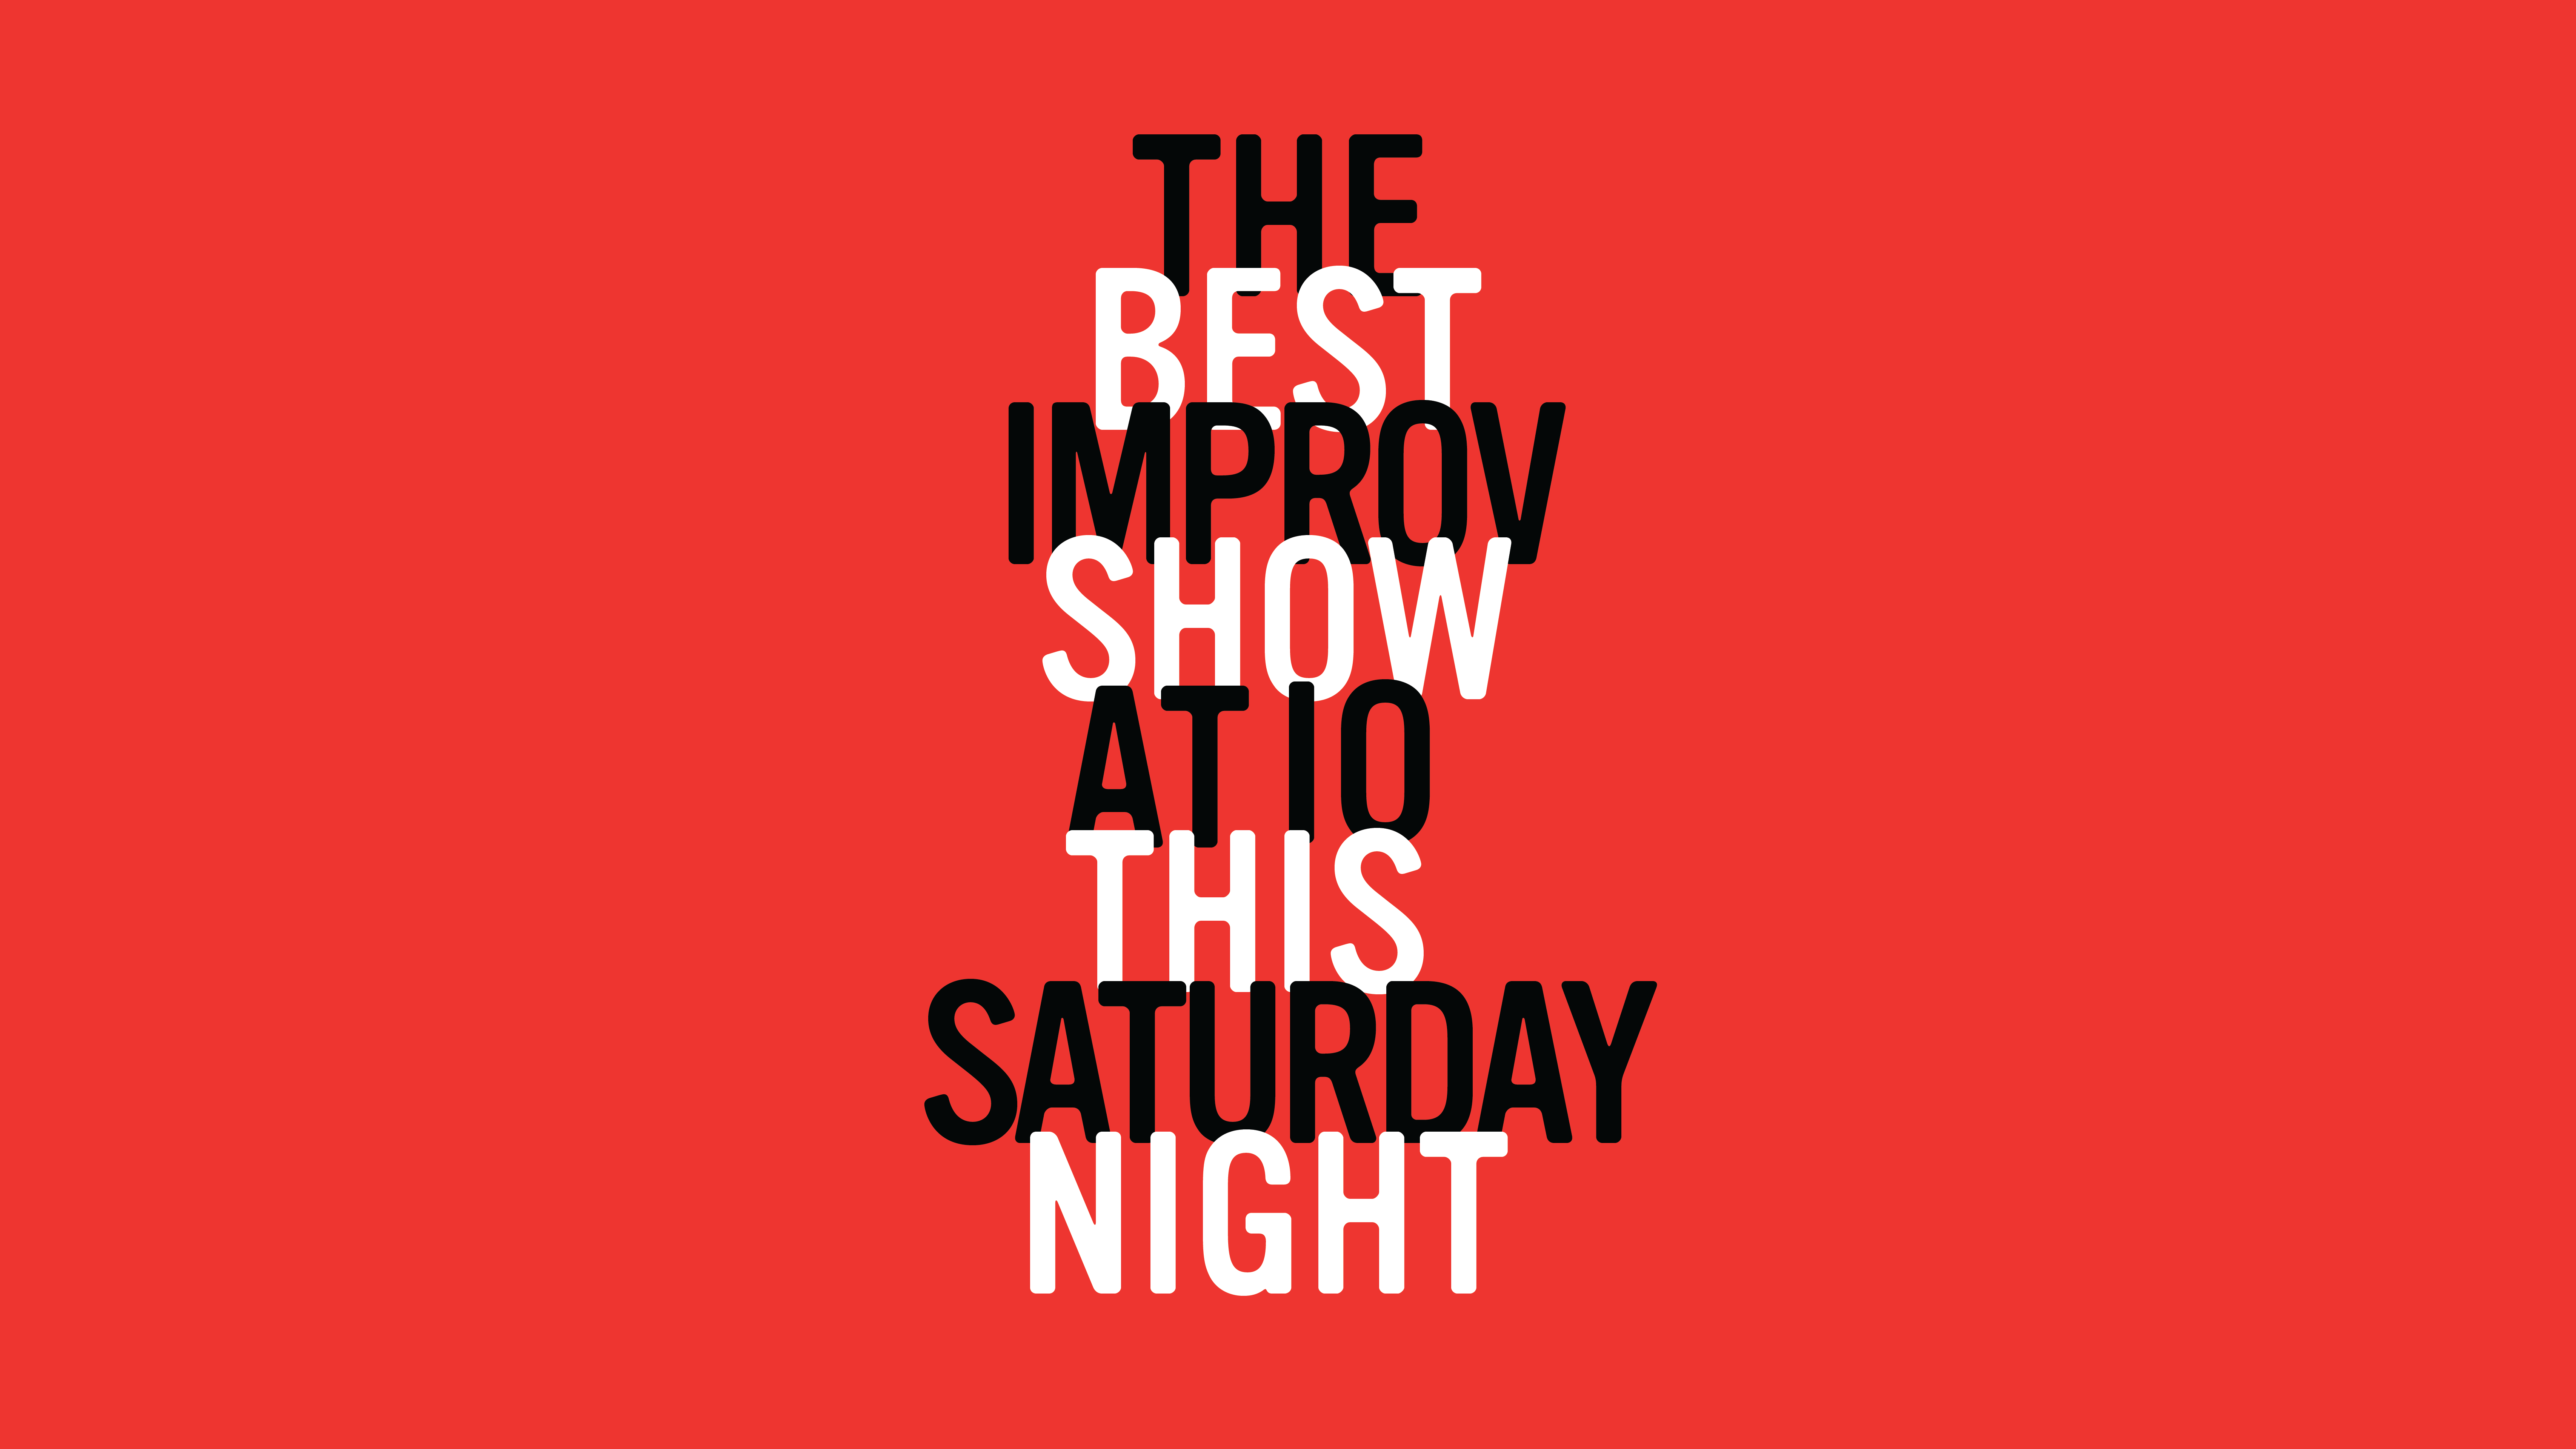 The Best Improv Show At iO This Saturday Night